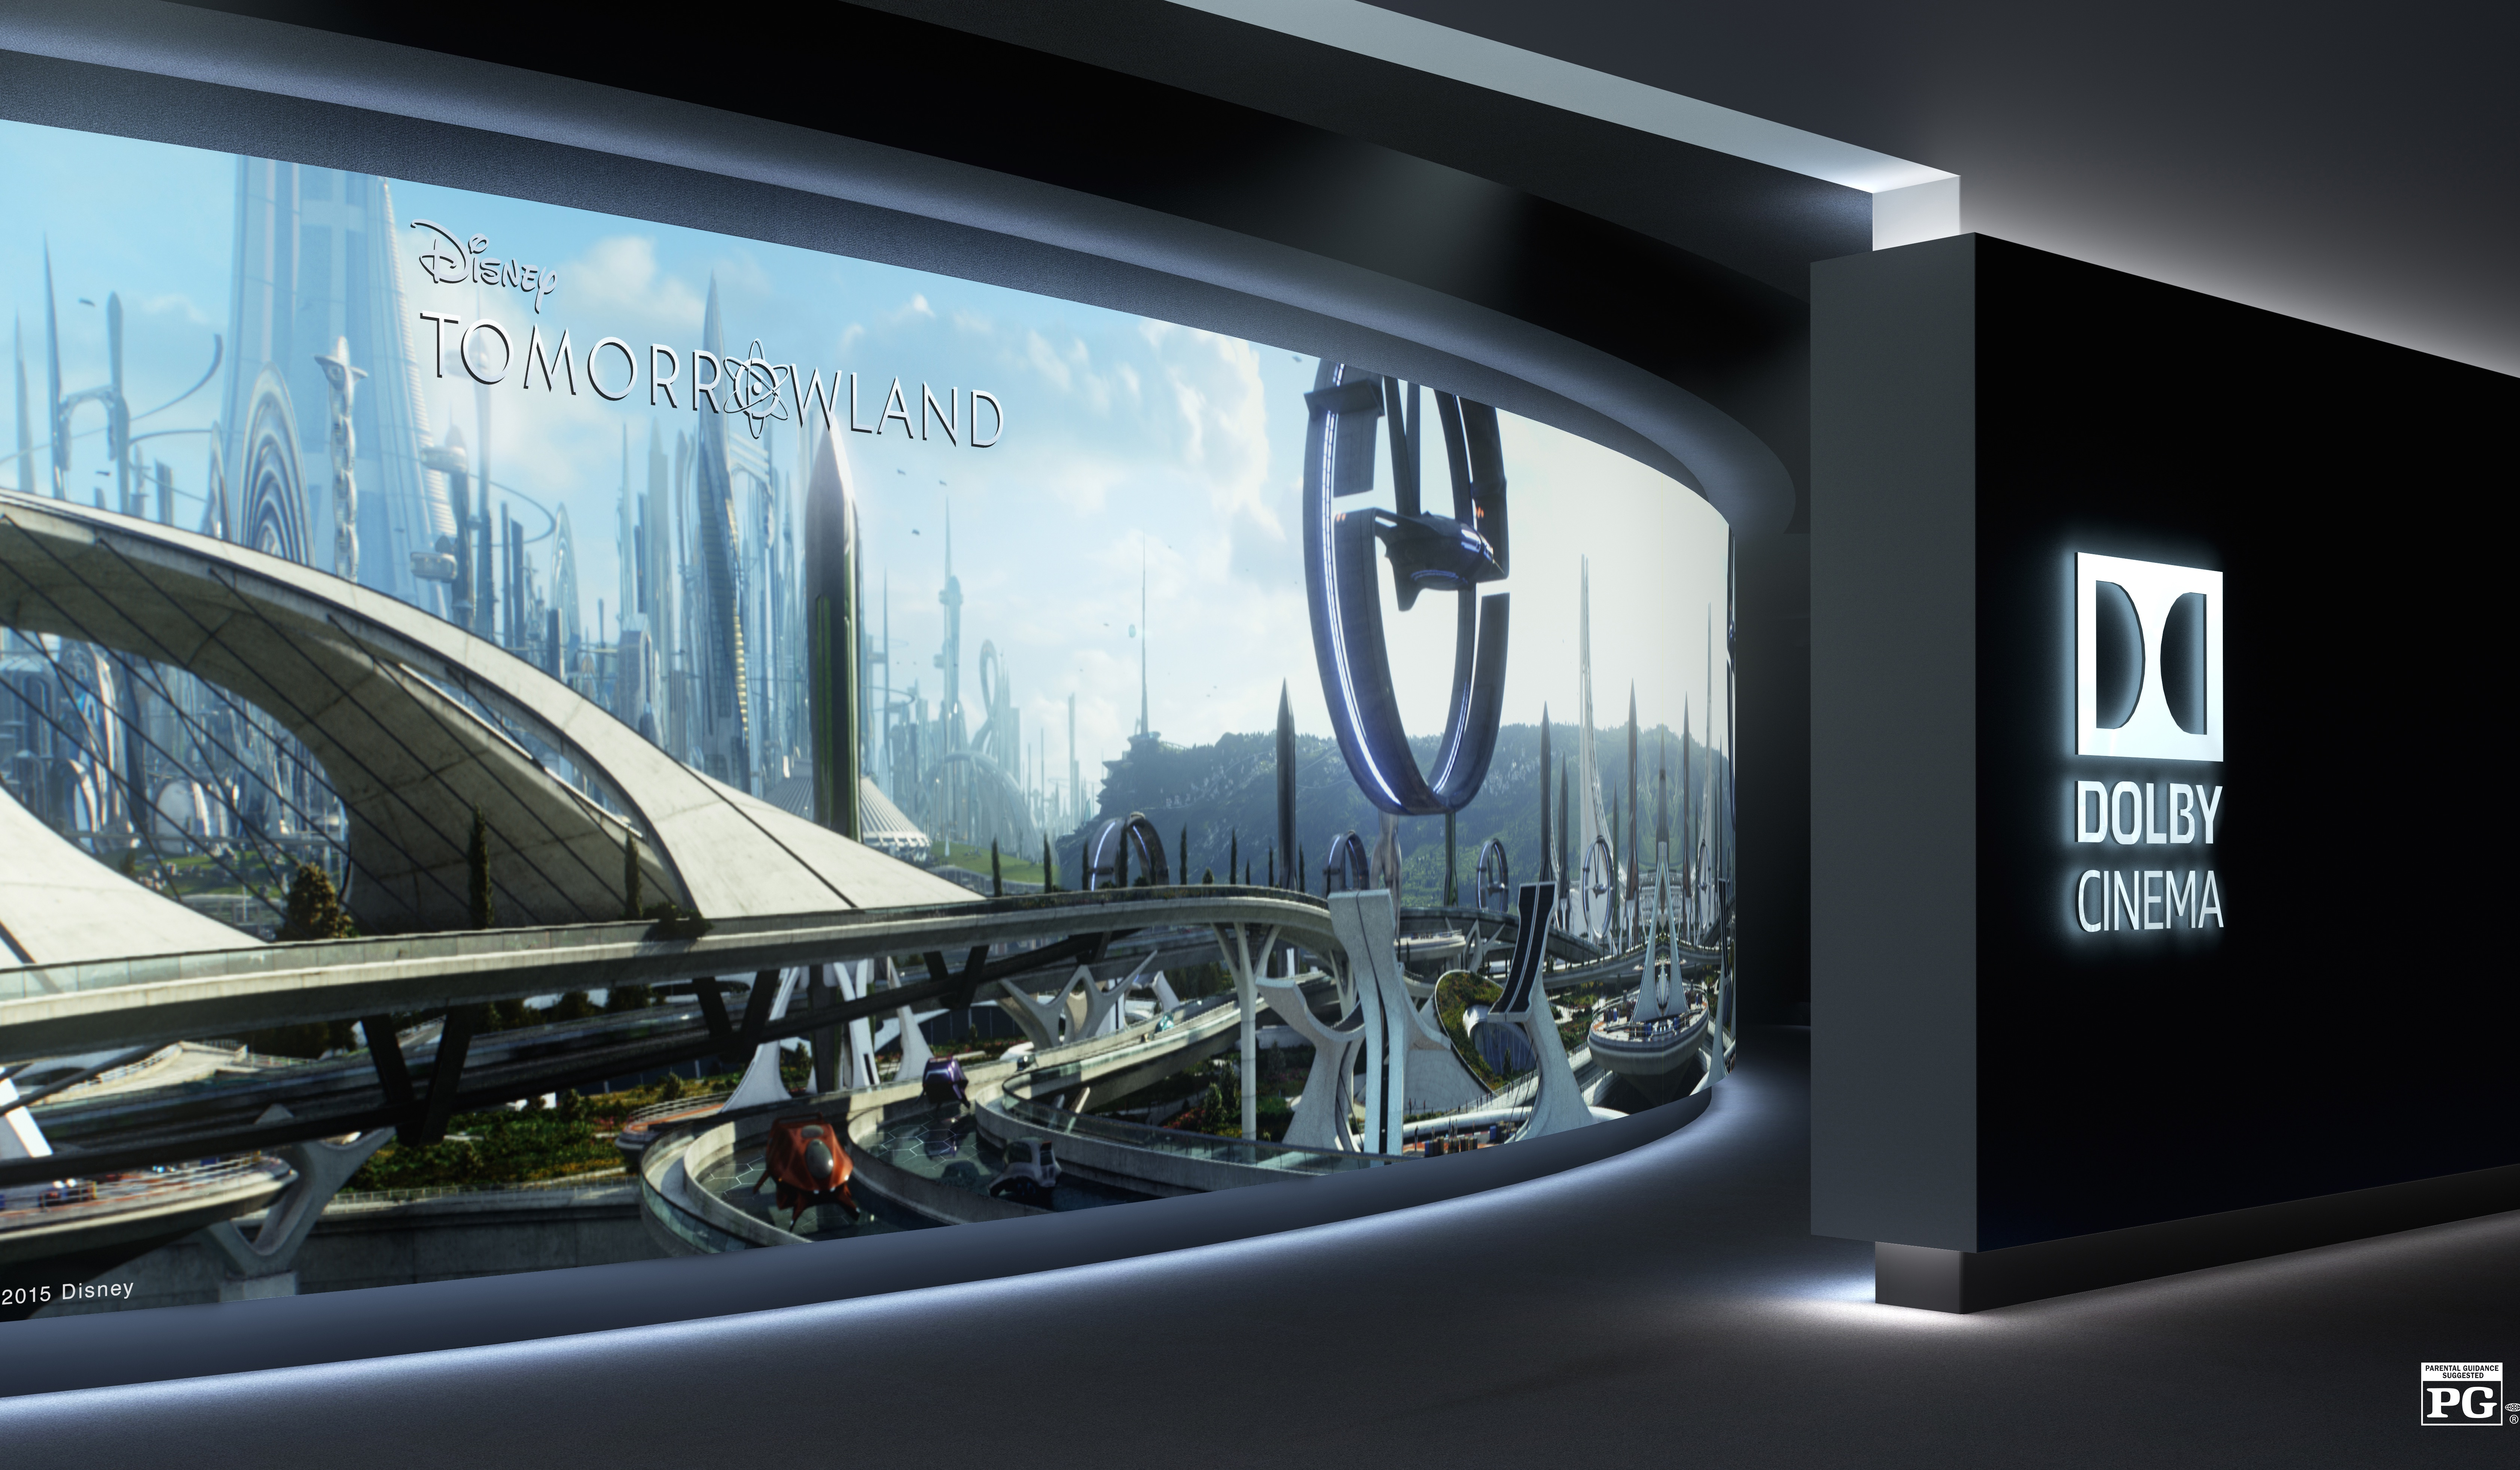 Dolby_Cinema.jpg